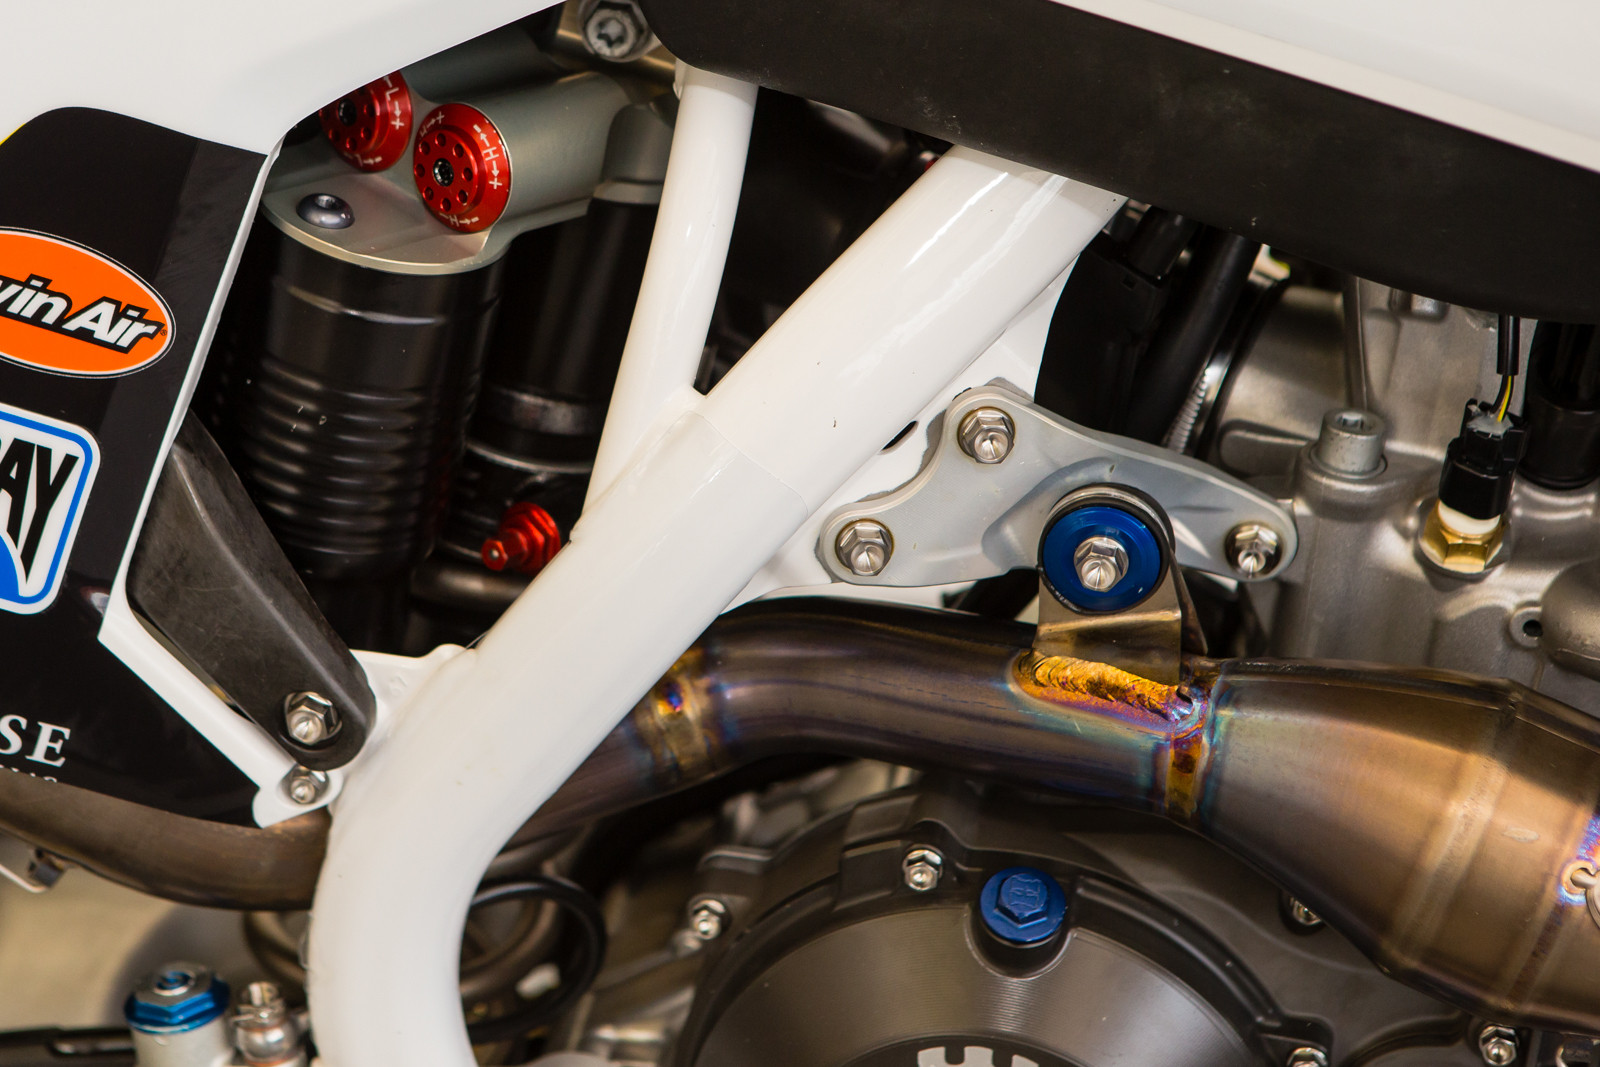 Rockstar Husqvarna Aluminum Engine Mount - Vital MX Pit Bits: Glendale - Motocross Pictures - Vital MX